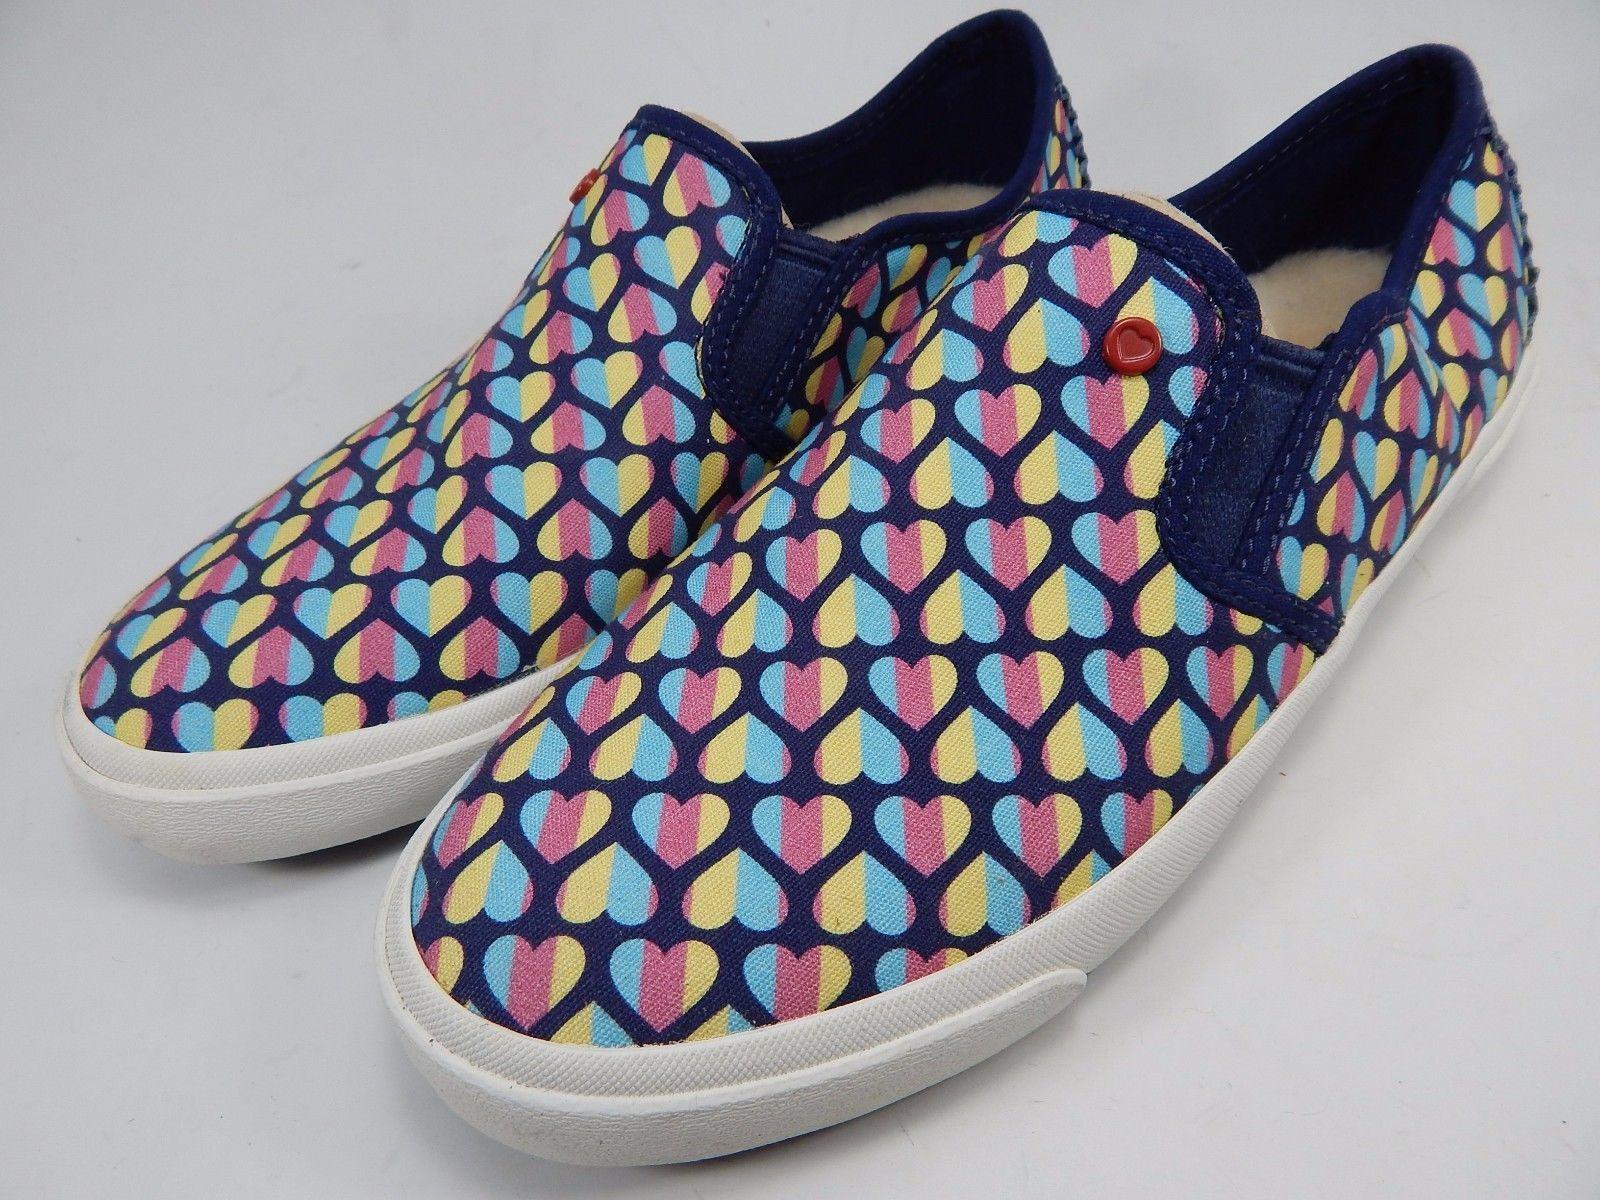 UGG Australia I Heart Slip On Rainbow Hearts Slippers Flats Size 7 M Blue Pink